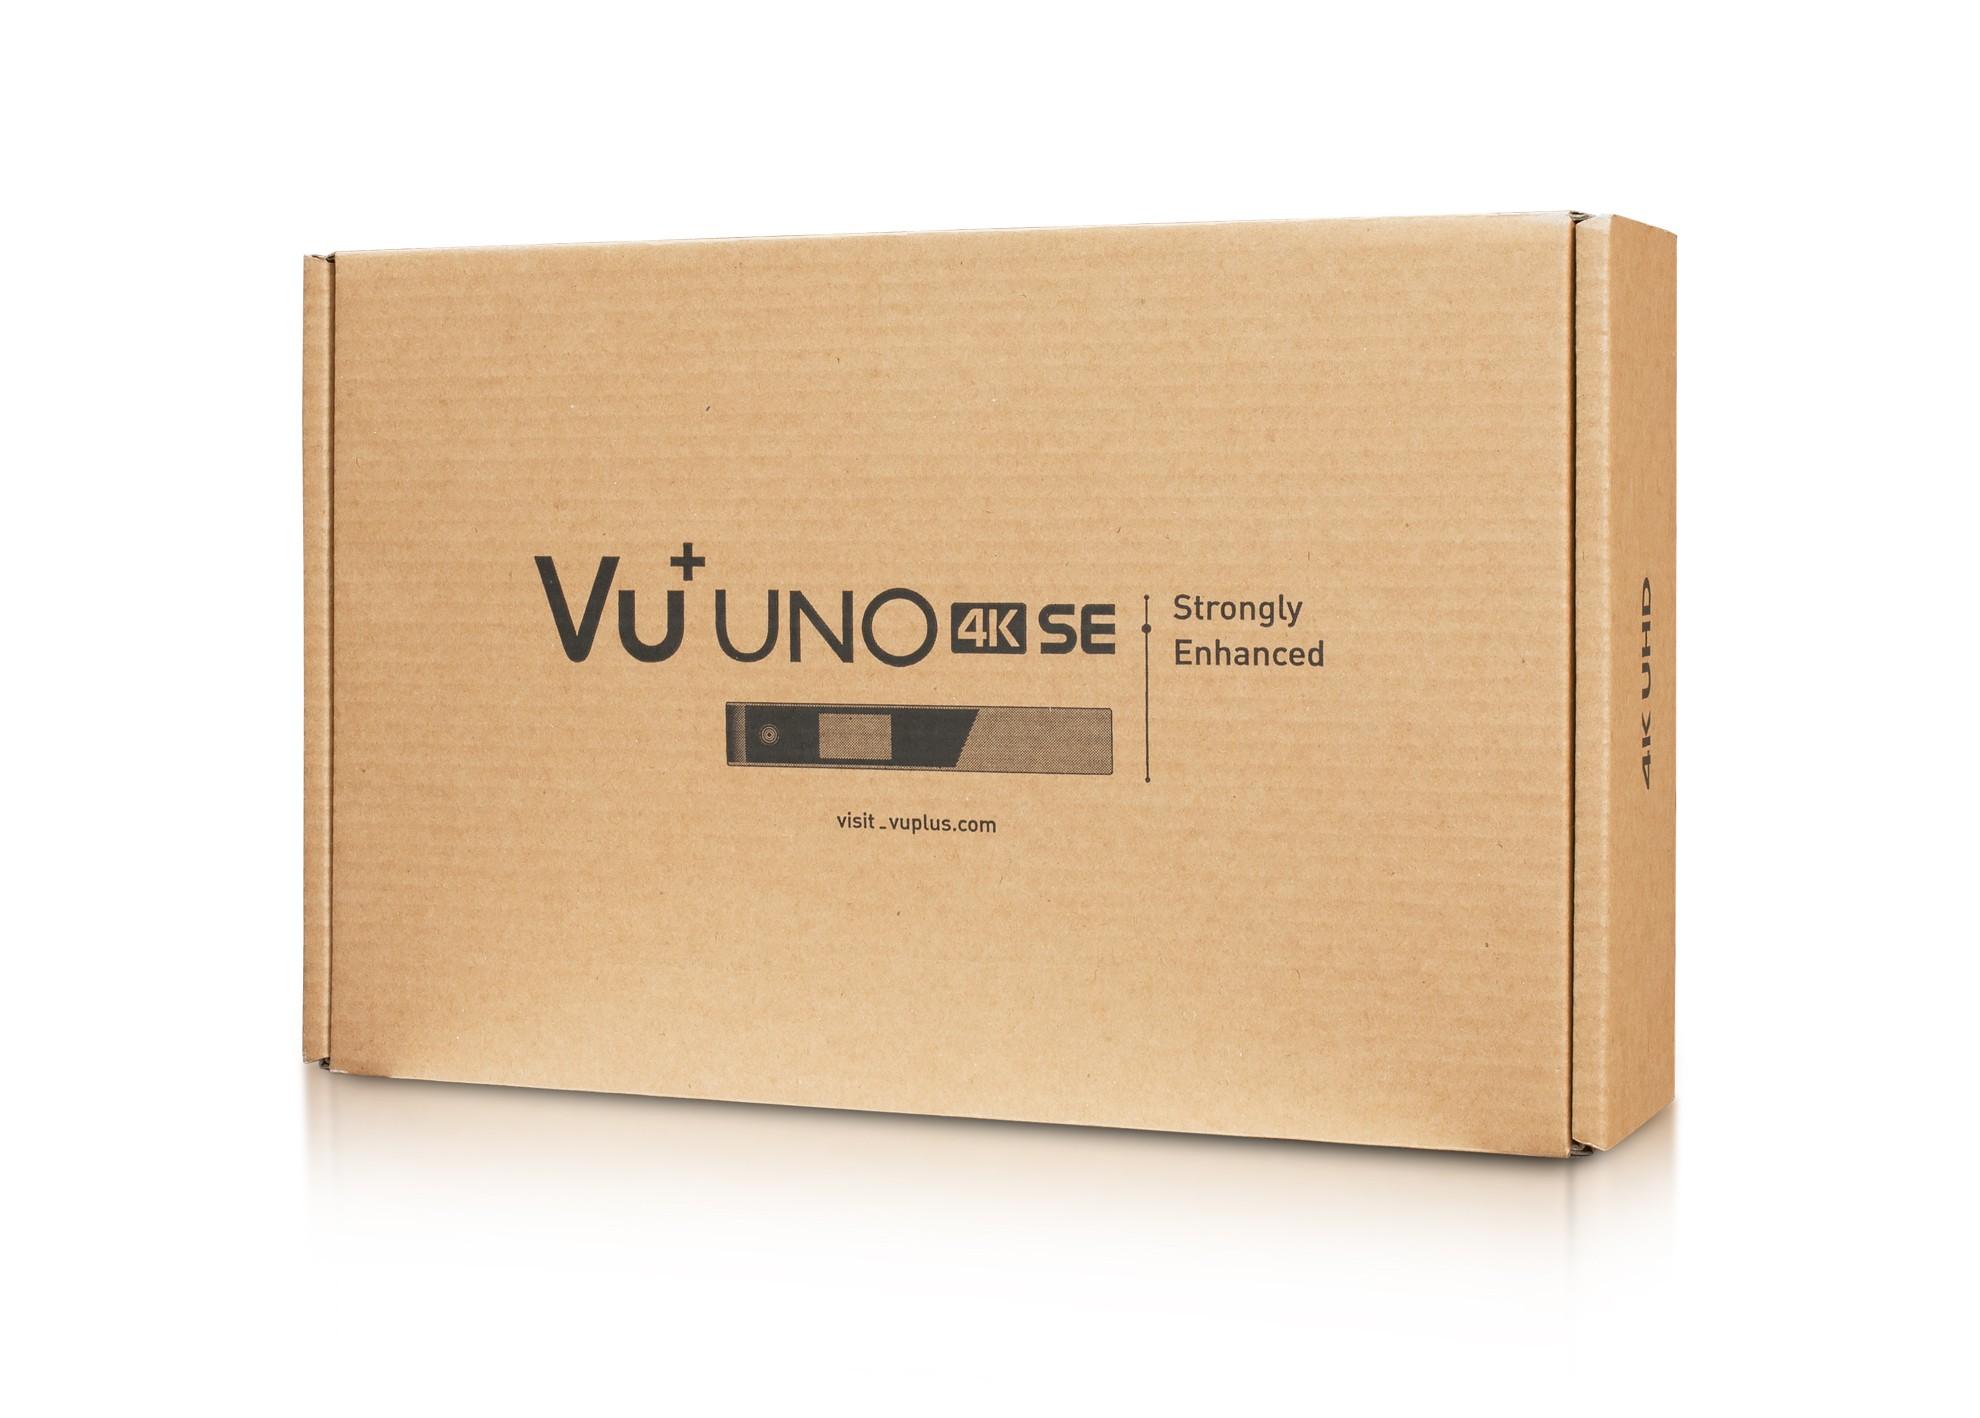 VU+ UNO 4K SE (Dual FBC-C tuner)